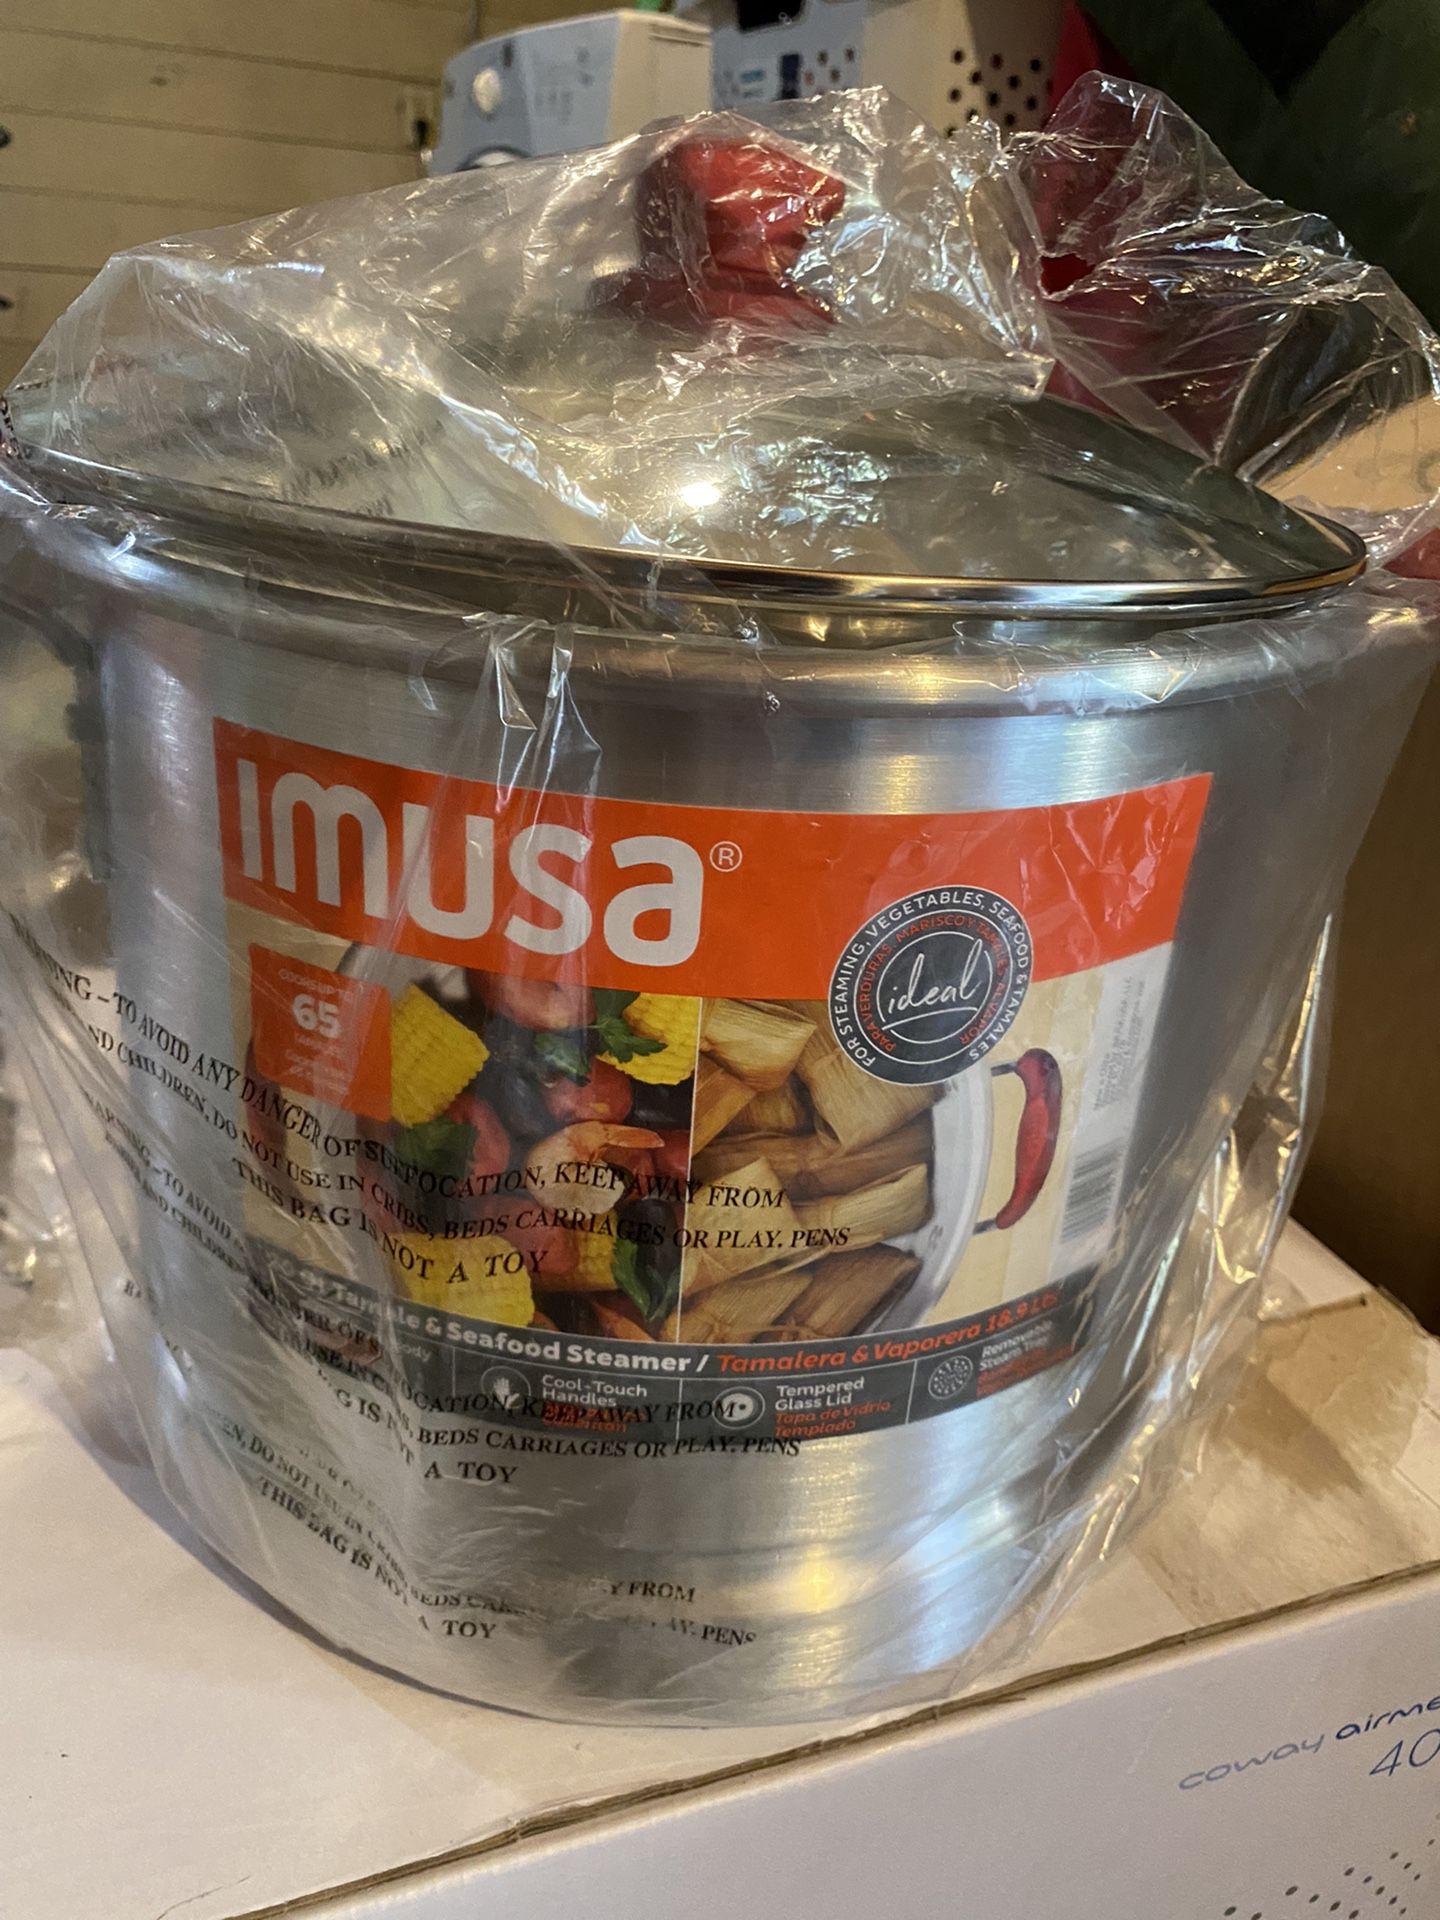 Imusa Steamer Pot